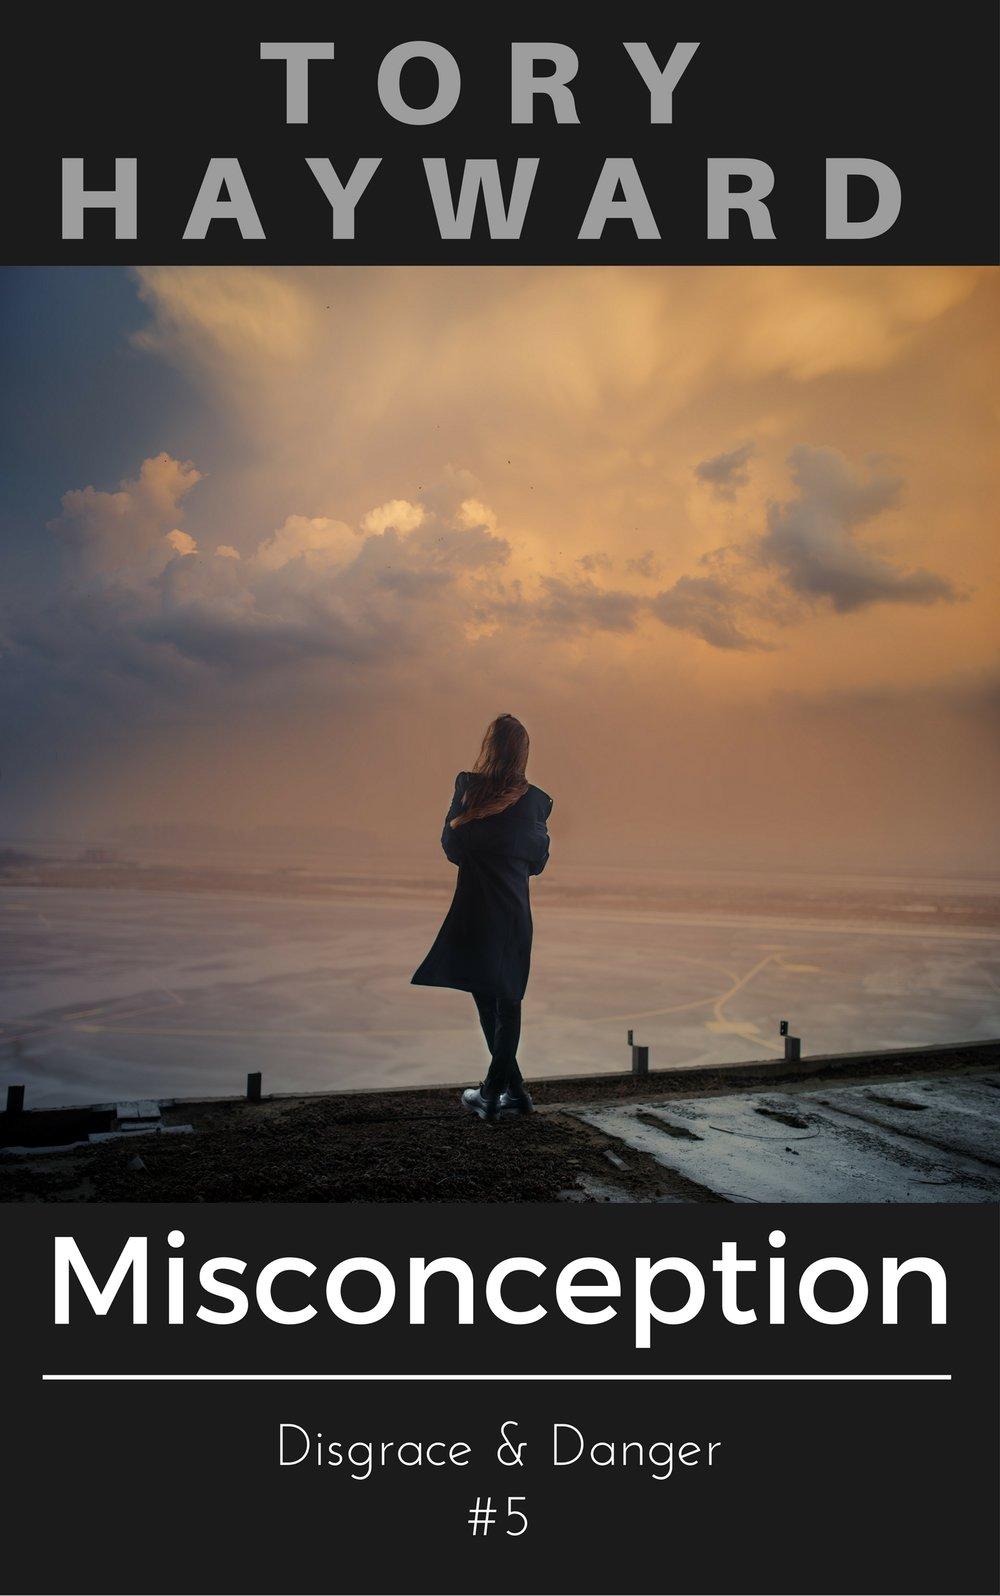 Copy of Disgrace & Danger #5: Misconception